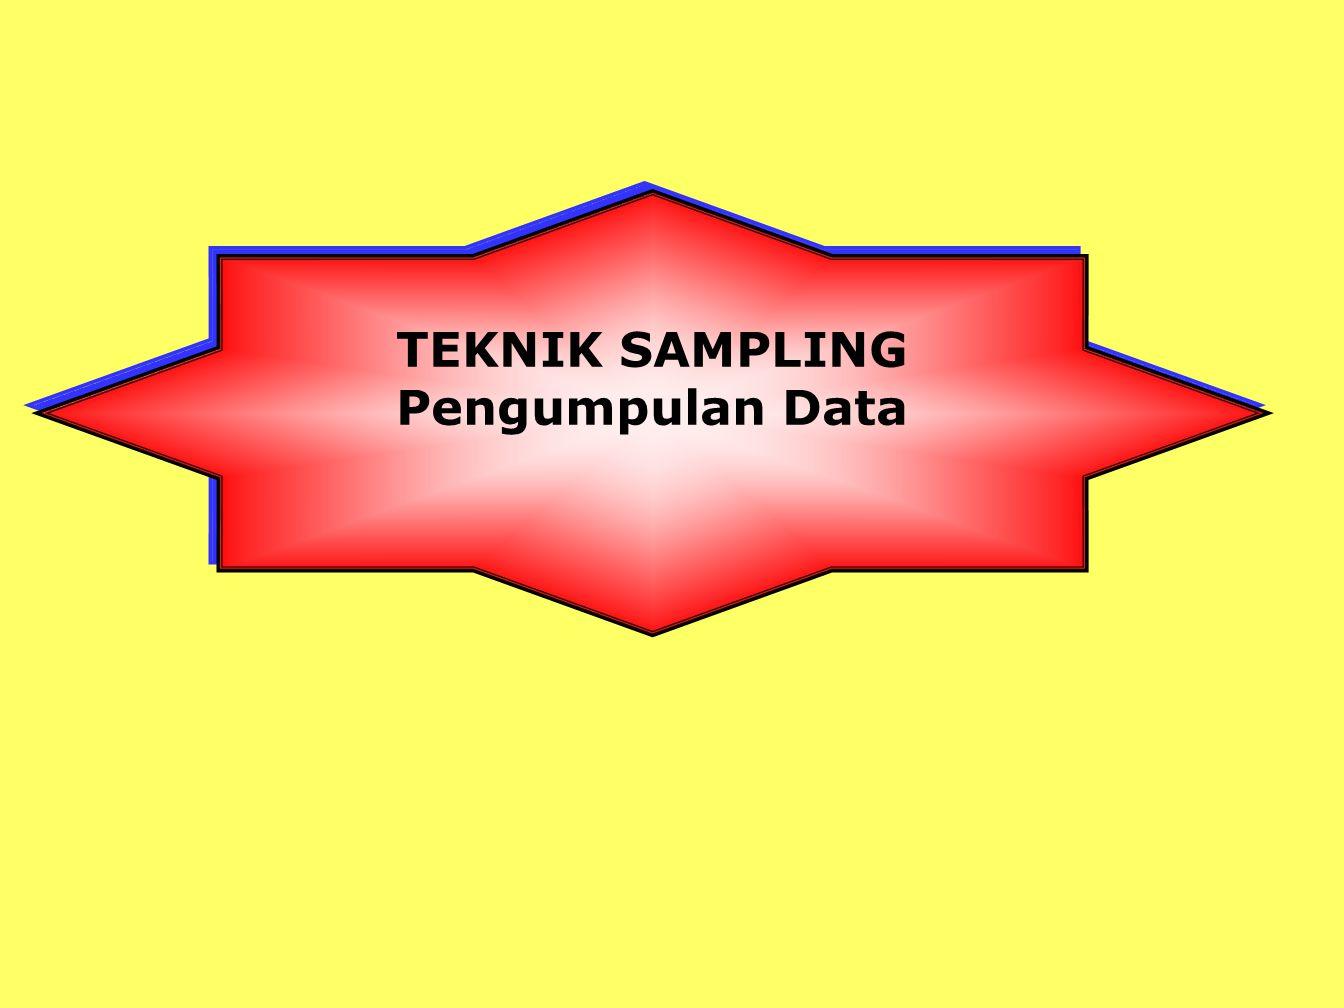 TEKNIK SAMPLING Pengumpulan Data